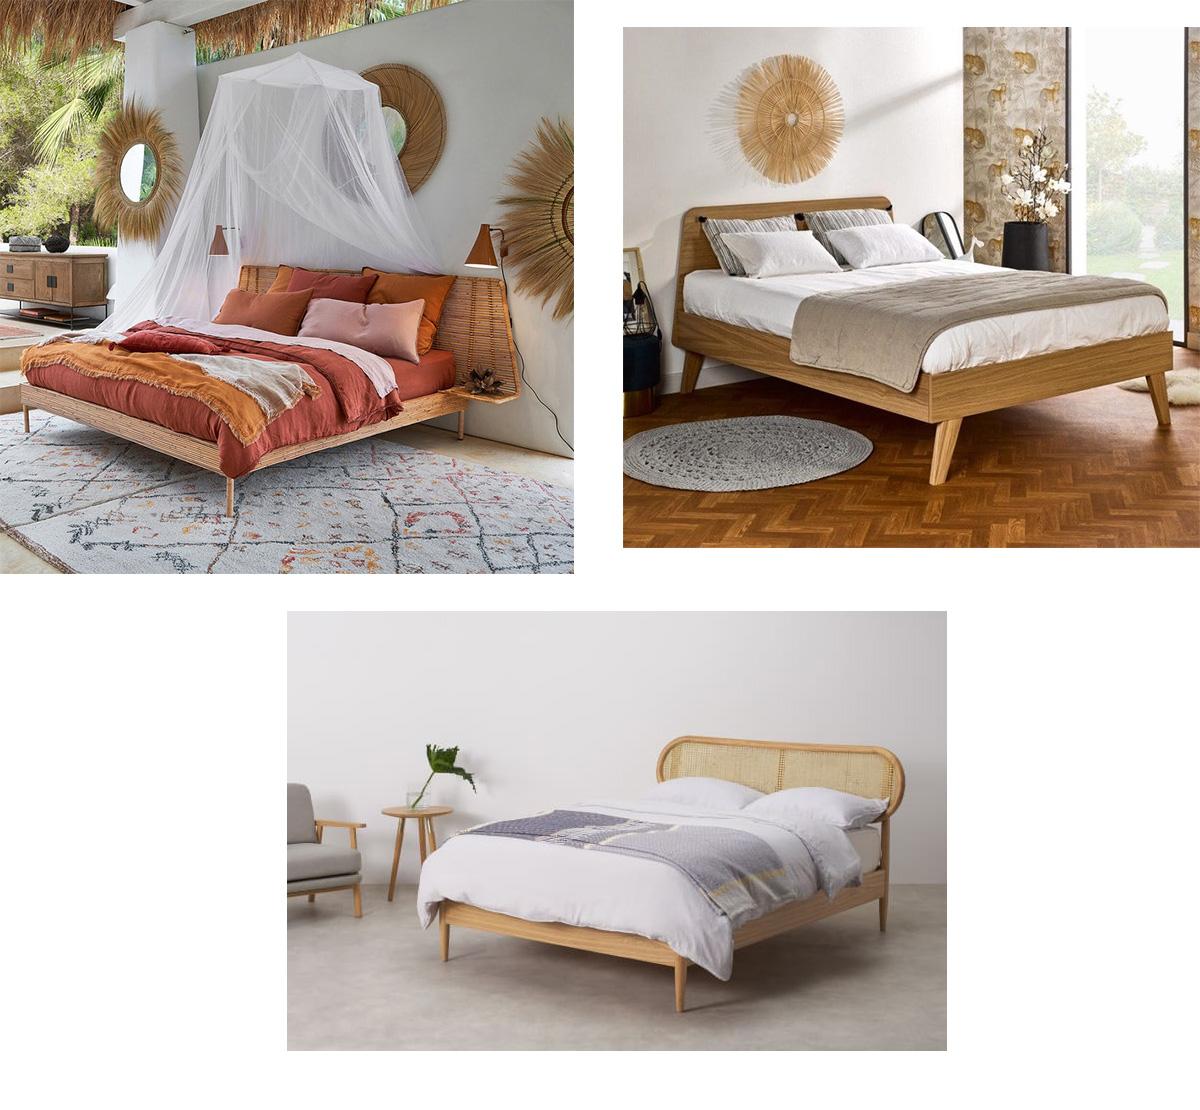 bien choisir sa structure de lit chambre bois rotin osier bambou